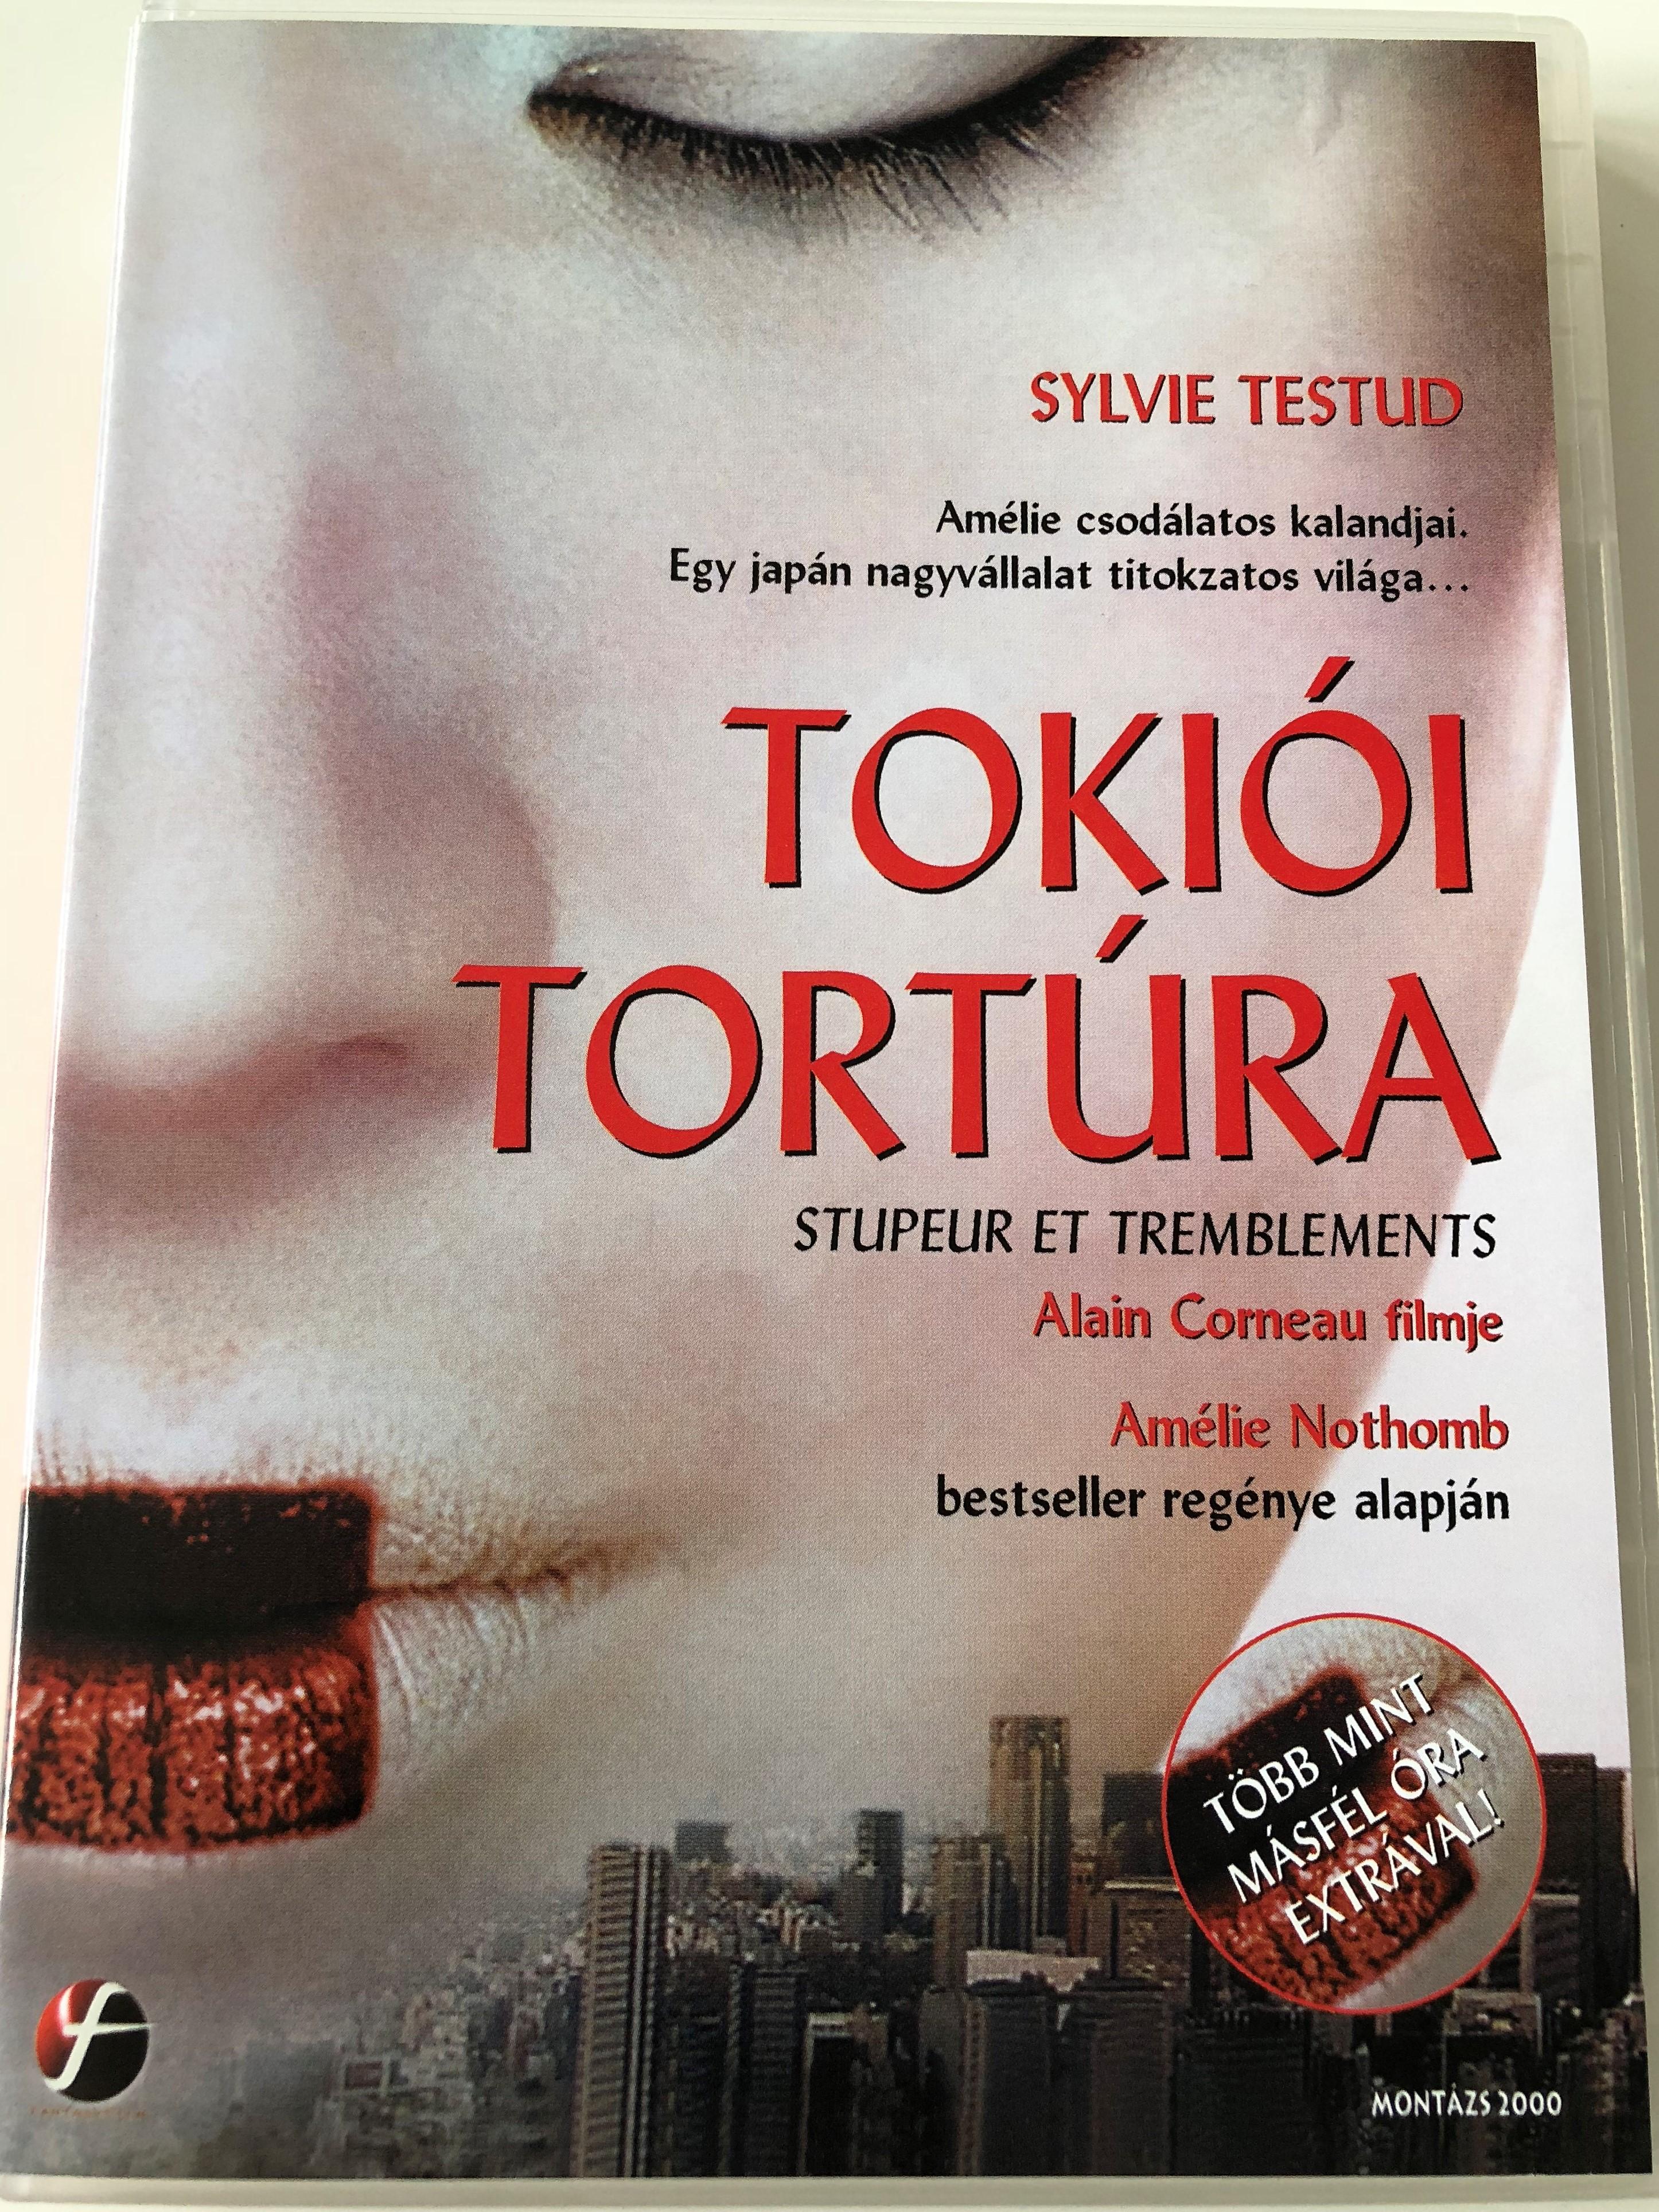 stupeur-et-tremblements-fear-and-trembling-dvd-2003-a-toki-i-tort-ra-directed-by-alain-corneau-starring-sylvie-testud-kaori-tsuji-taro-suwa-bison-katayama-1-.jpg